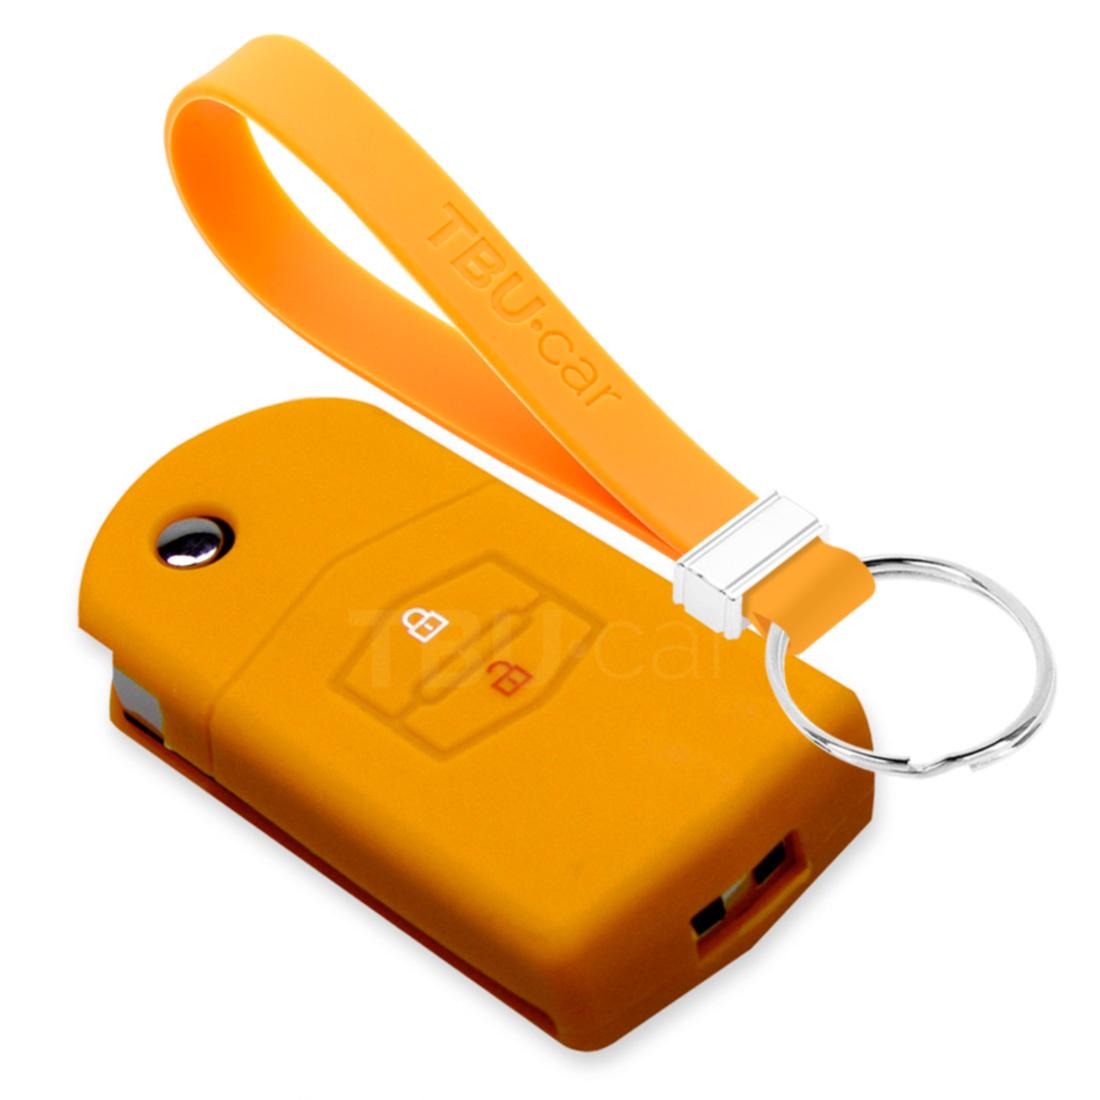 TBU car TBU car Autoschlüssel Hülle kompatibel mit Mazda 2 Tasten - Schutzhülle aus Silikon - Auto Schlüsselhülle Cover in Orange